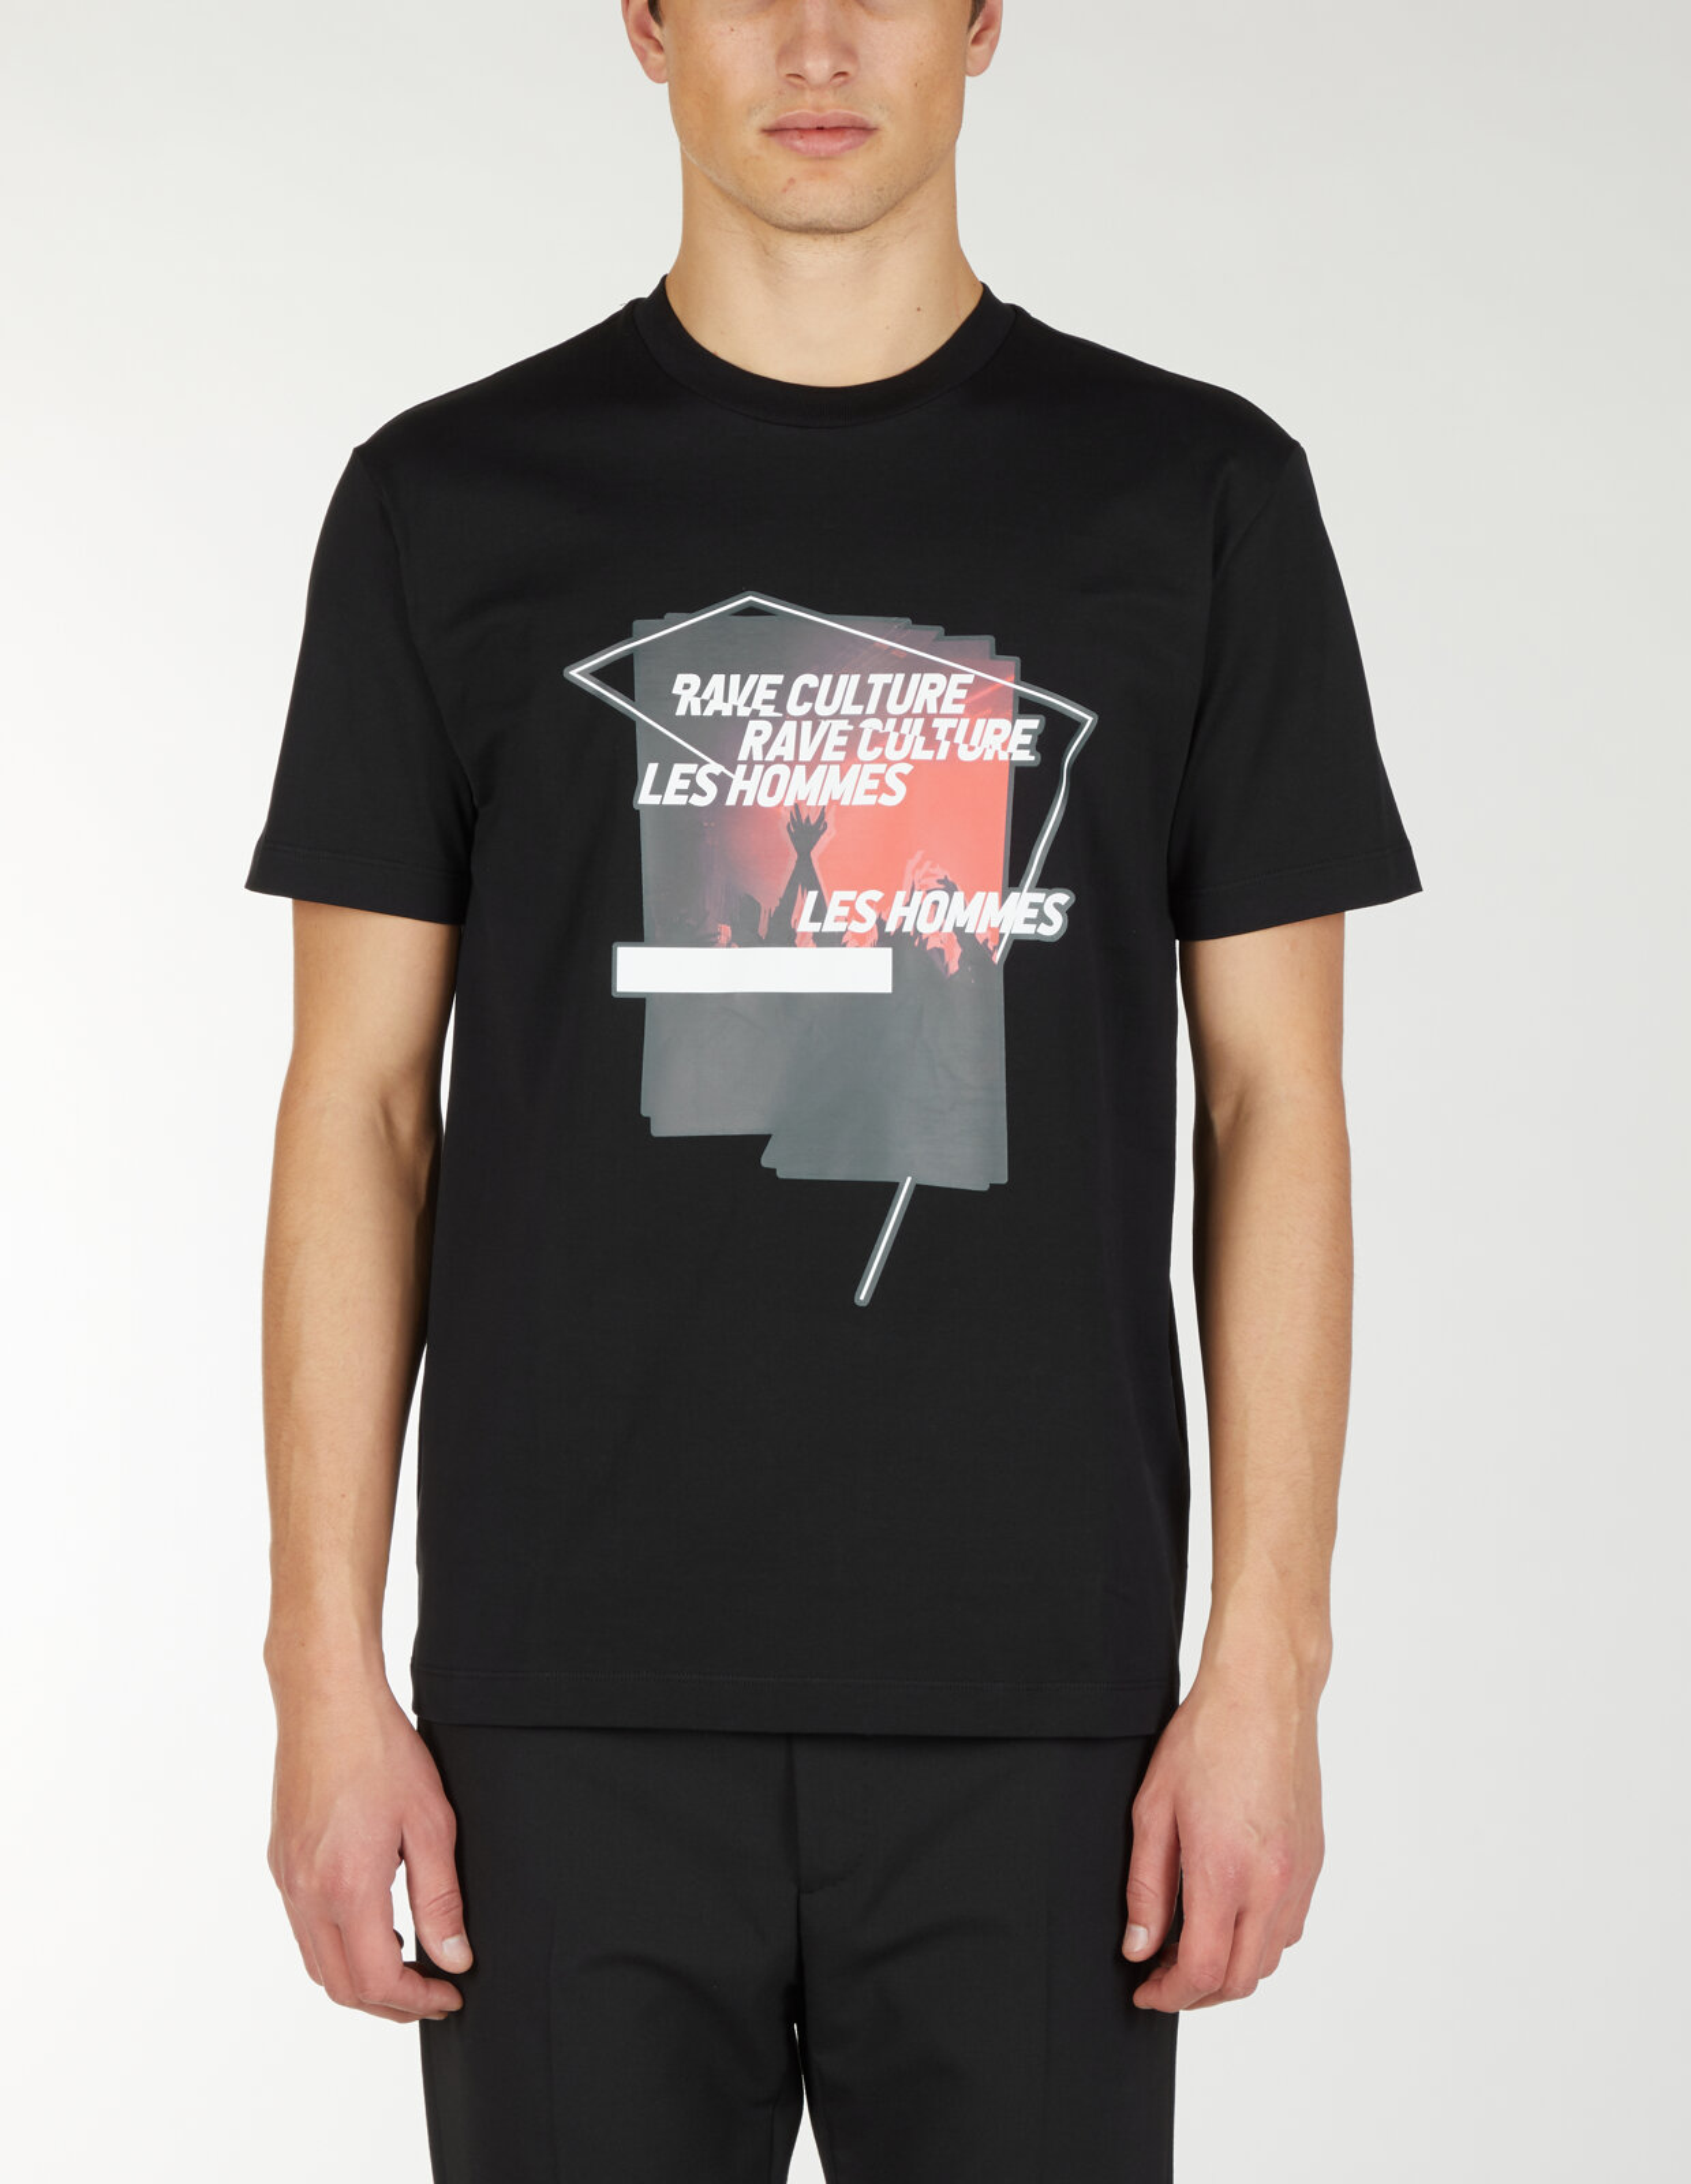 T-Shirt Con Stampa Rave Culture - Les Hommes